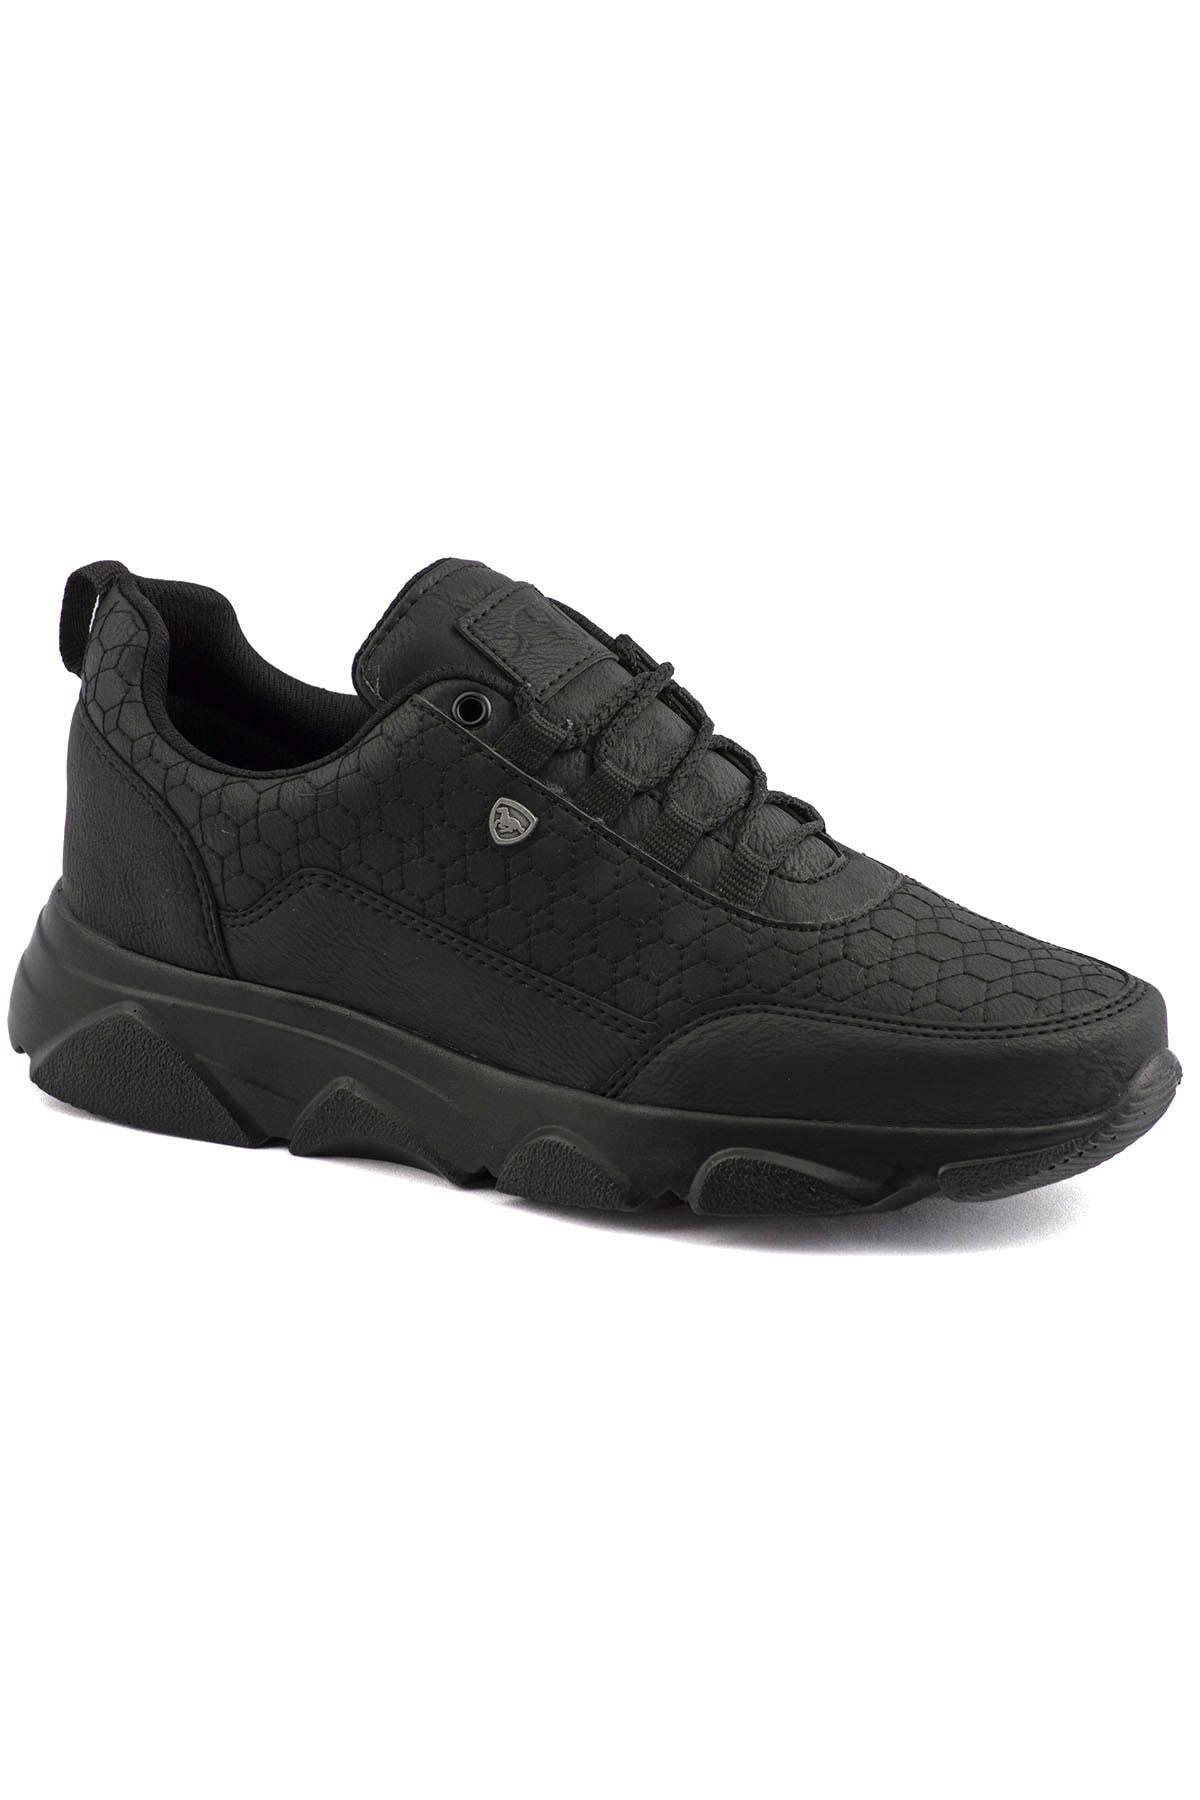 L.A Polo Erkek Siyah Spor Ayakkabı 005 1